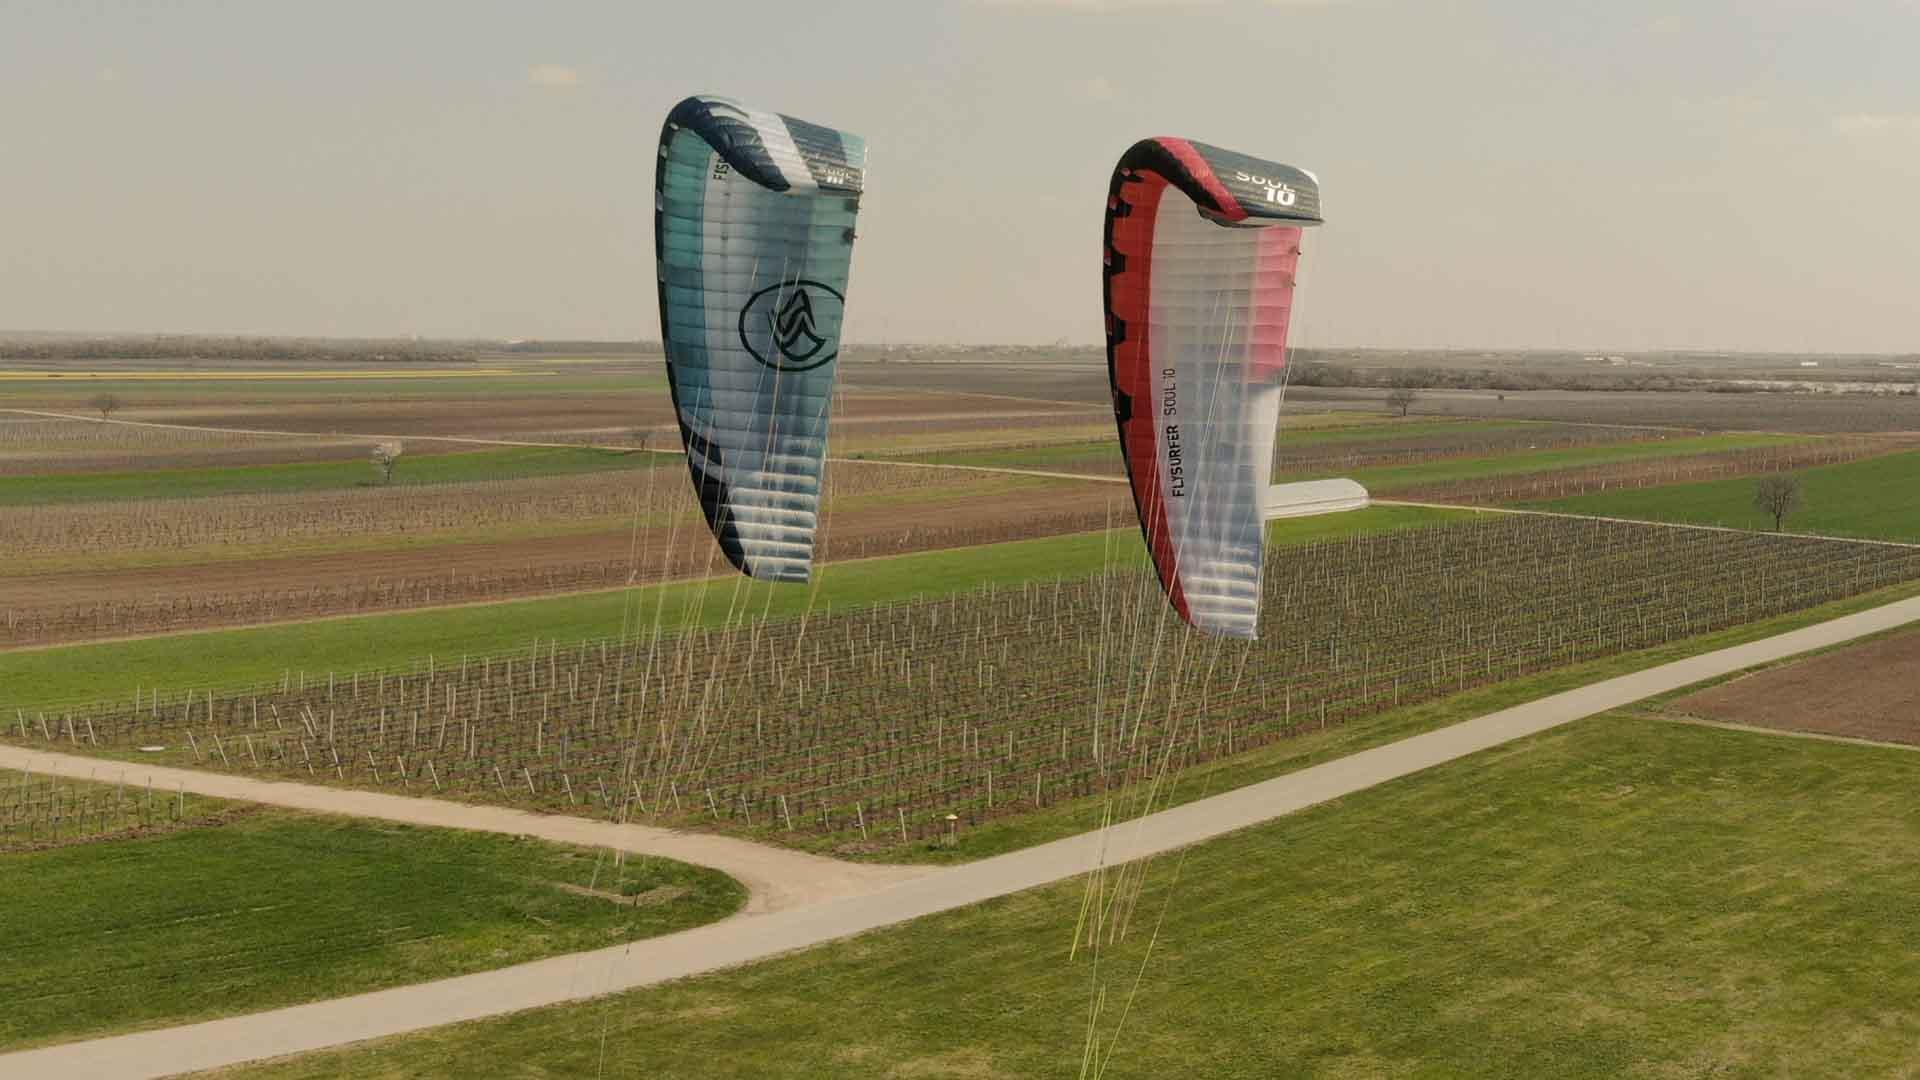 Drohnenaufnahme Flysurfer Soul 1 und Flysurfer Soul 2